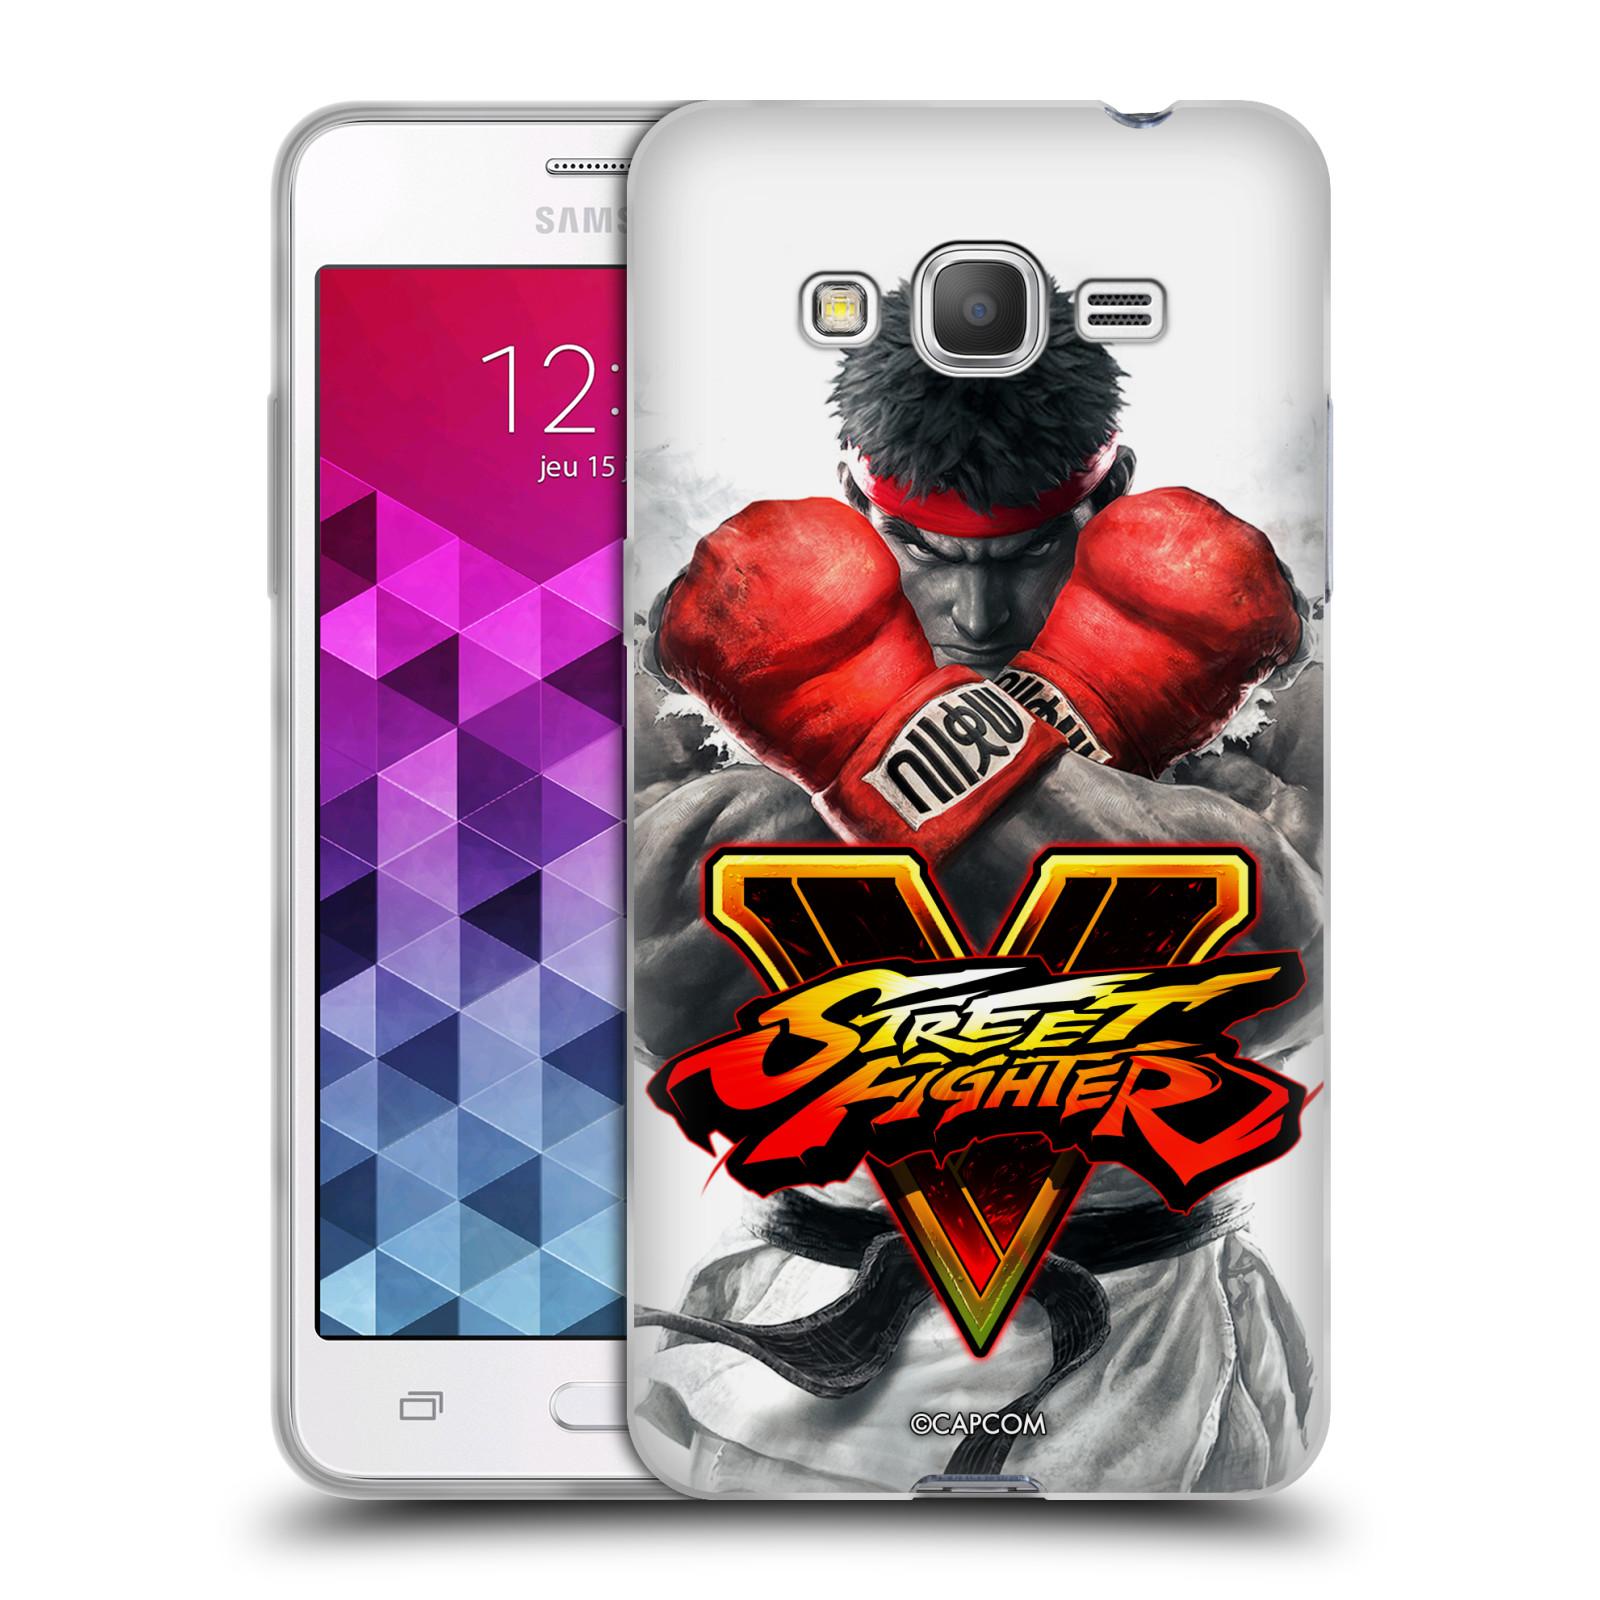 HEAD CASE silikonový obal na mobil Samsung Galaxy Grand Prime oficiální kryt STREET FIGHTER Boxer Ryu